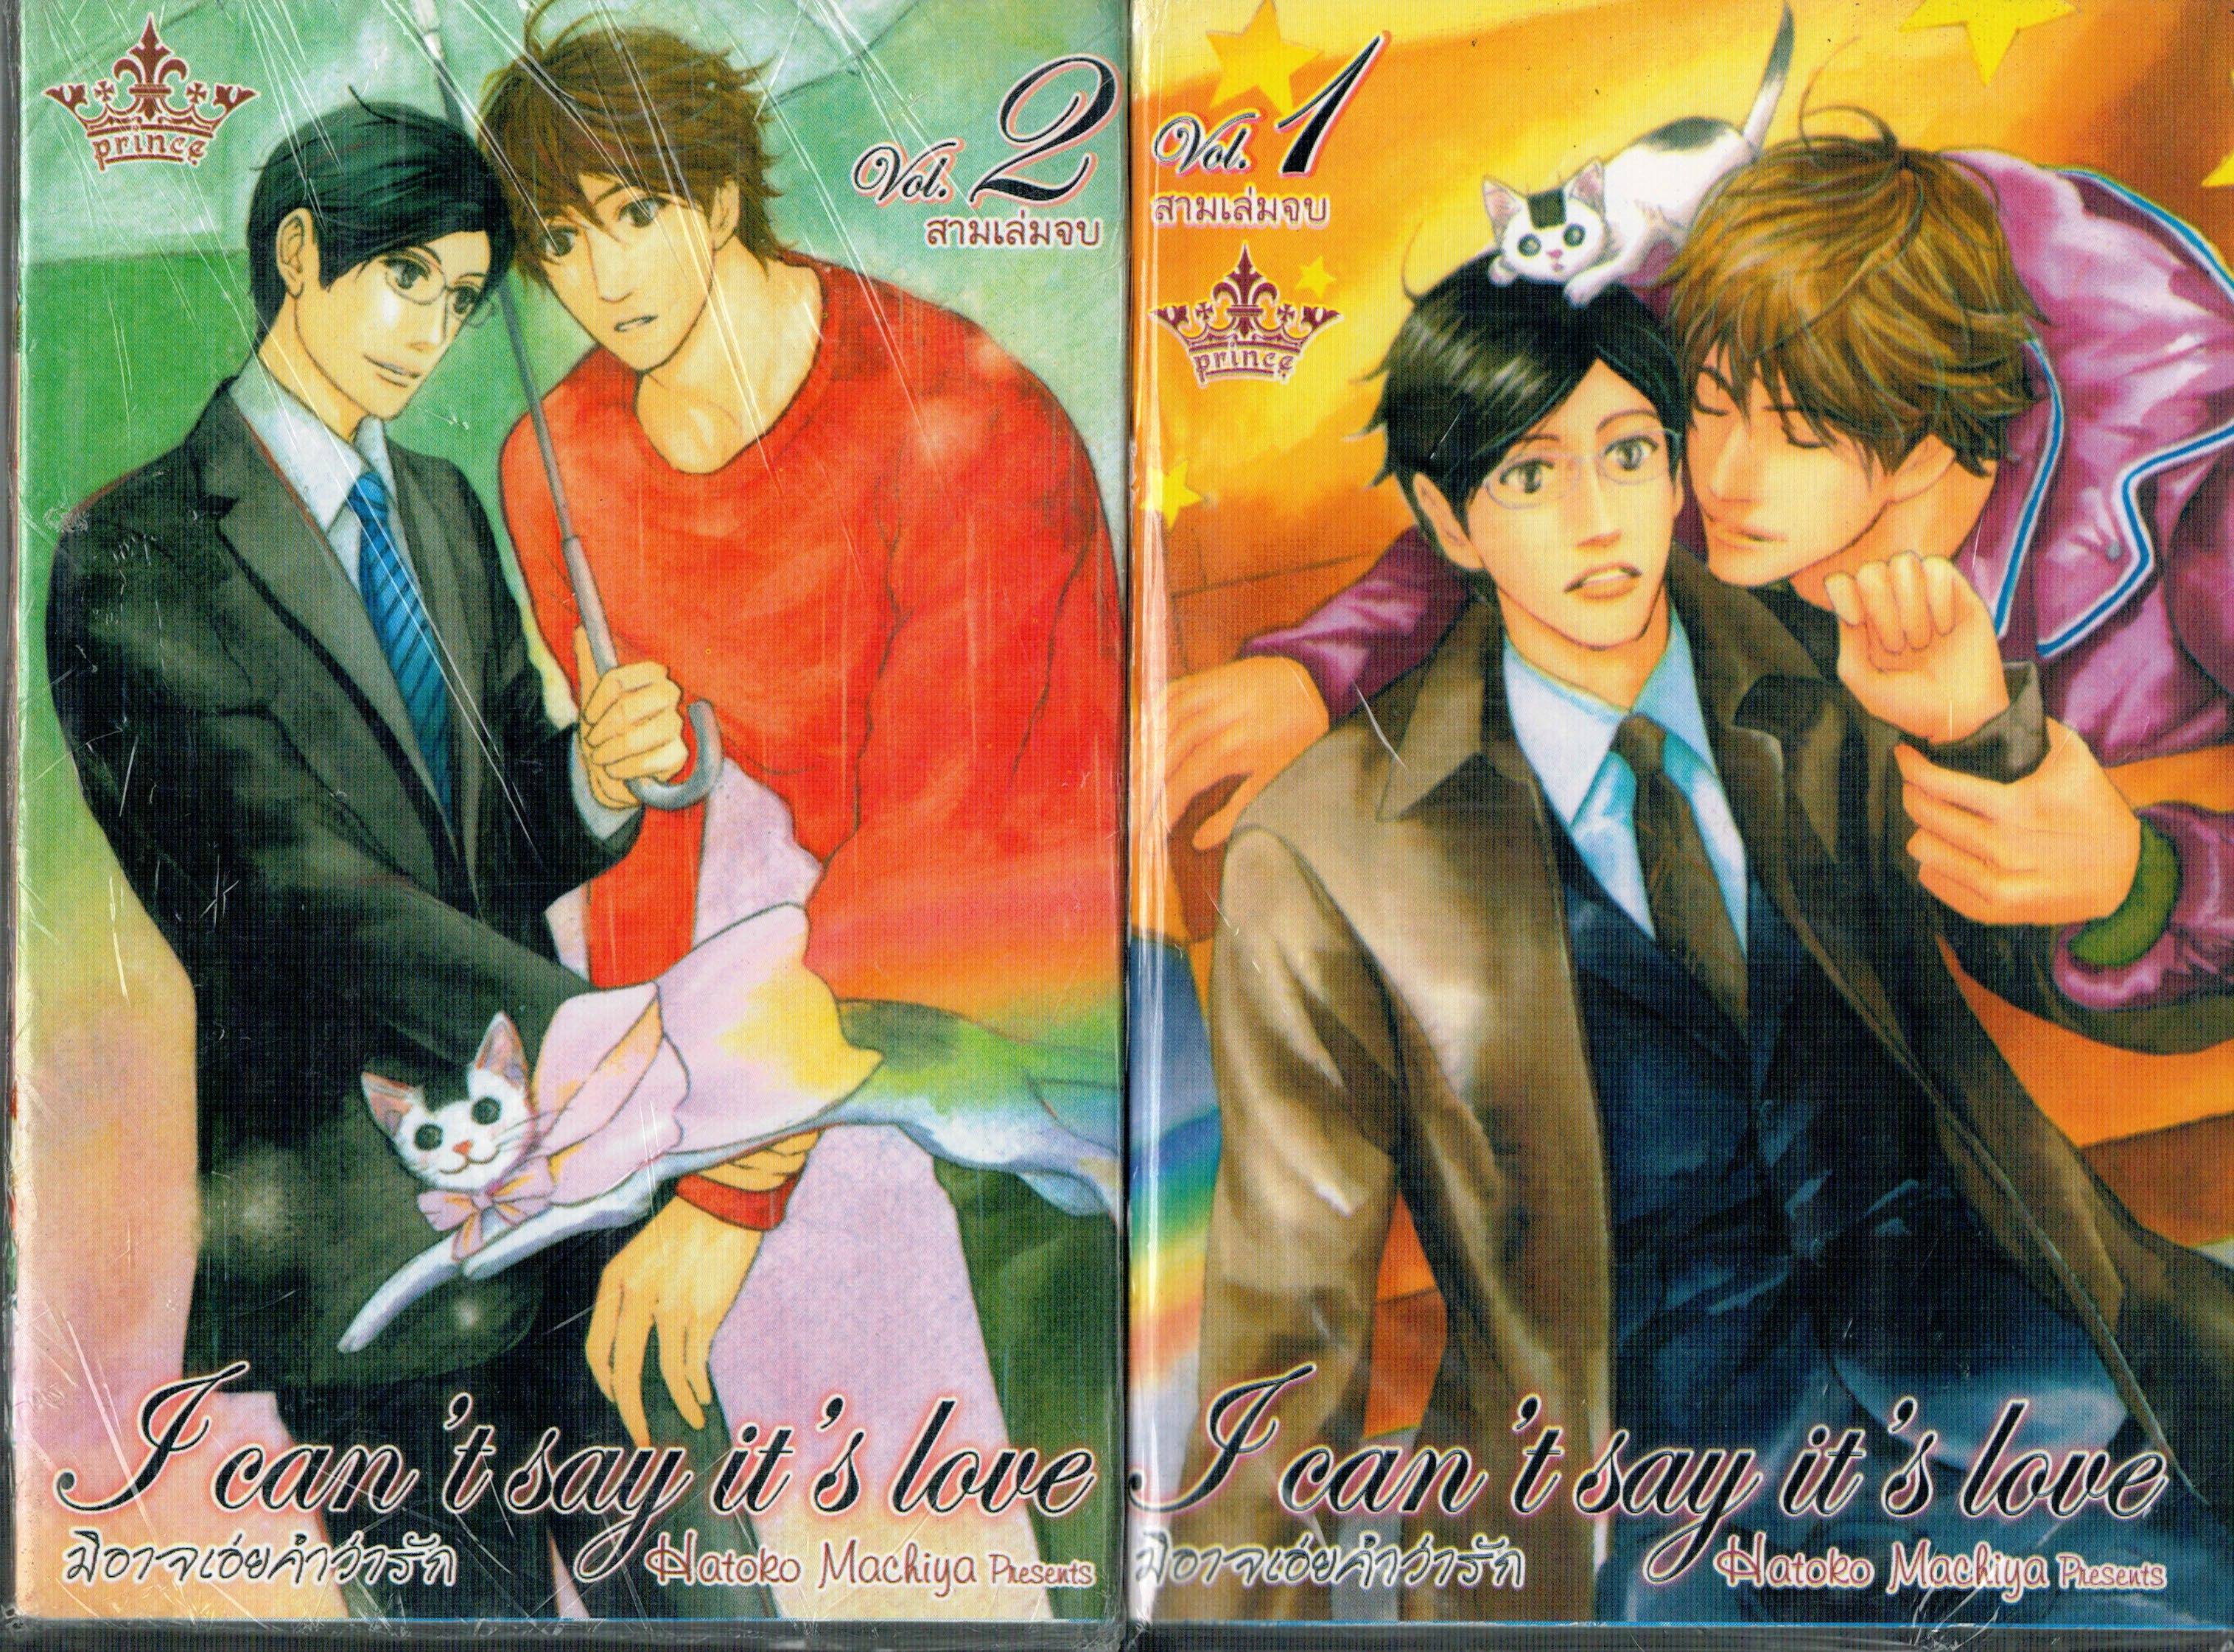 I can't say it's love มิอาจเอ่ยคำว่ารัก : Hatako Mackiya 3 เล่มจบ